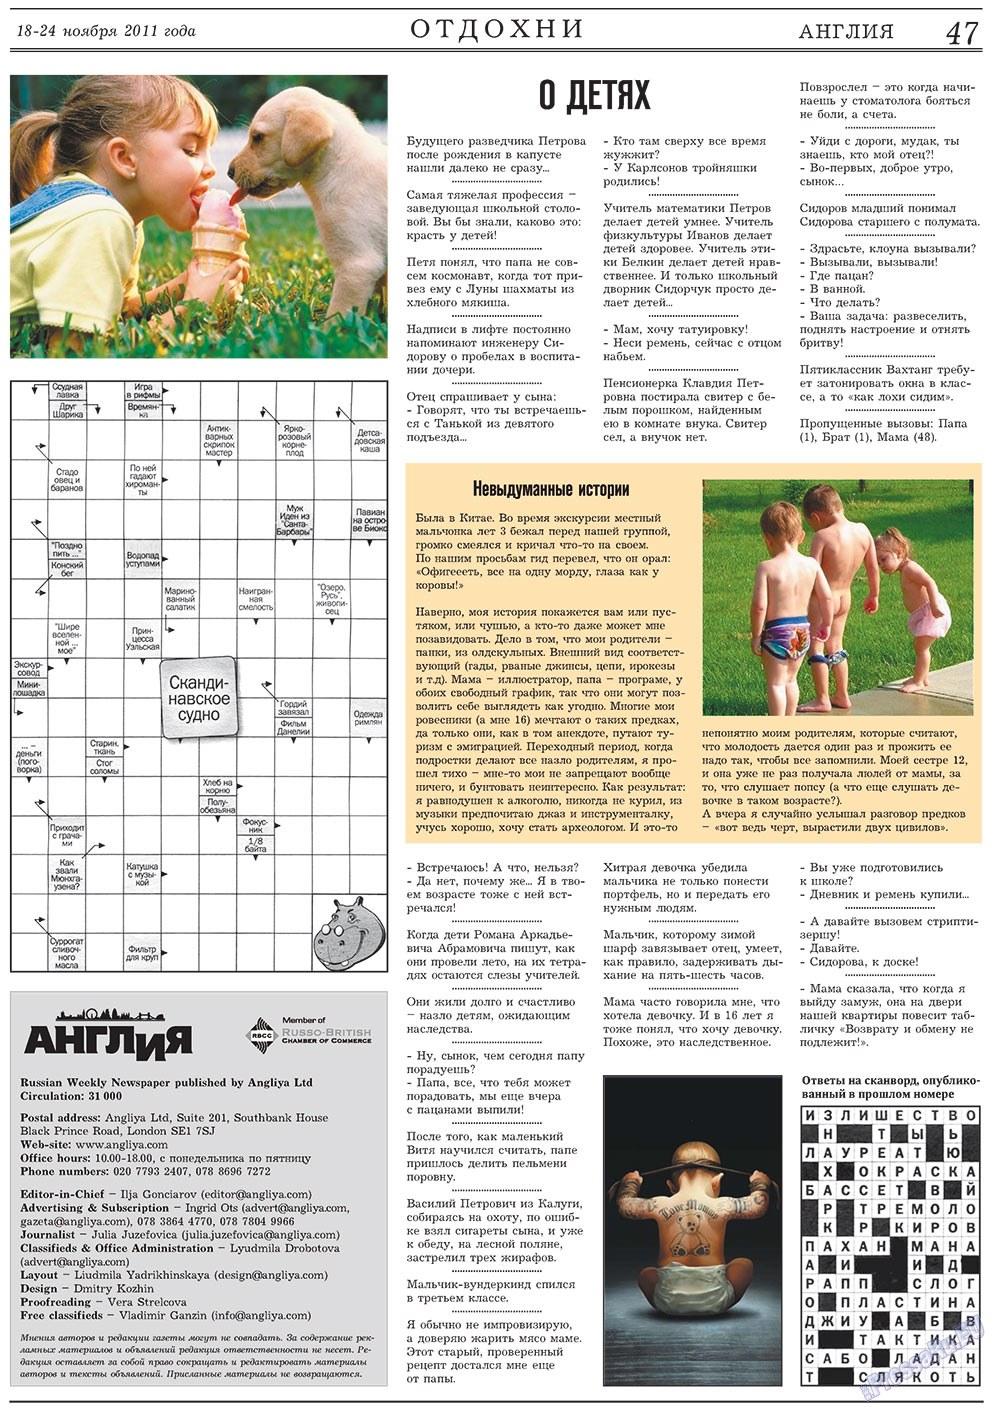 Англия (газета). 2011 год, номер 42, стр. 47